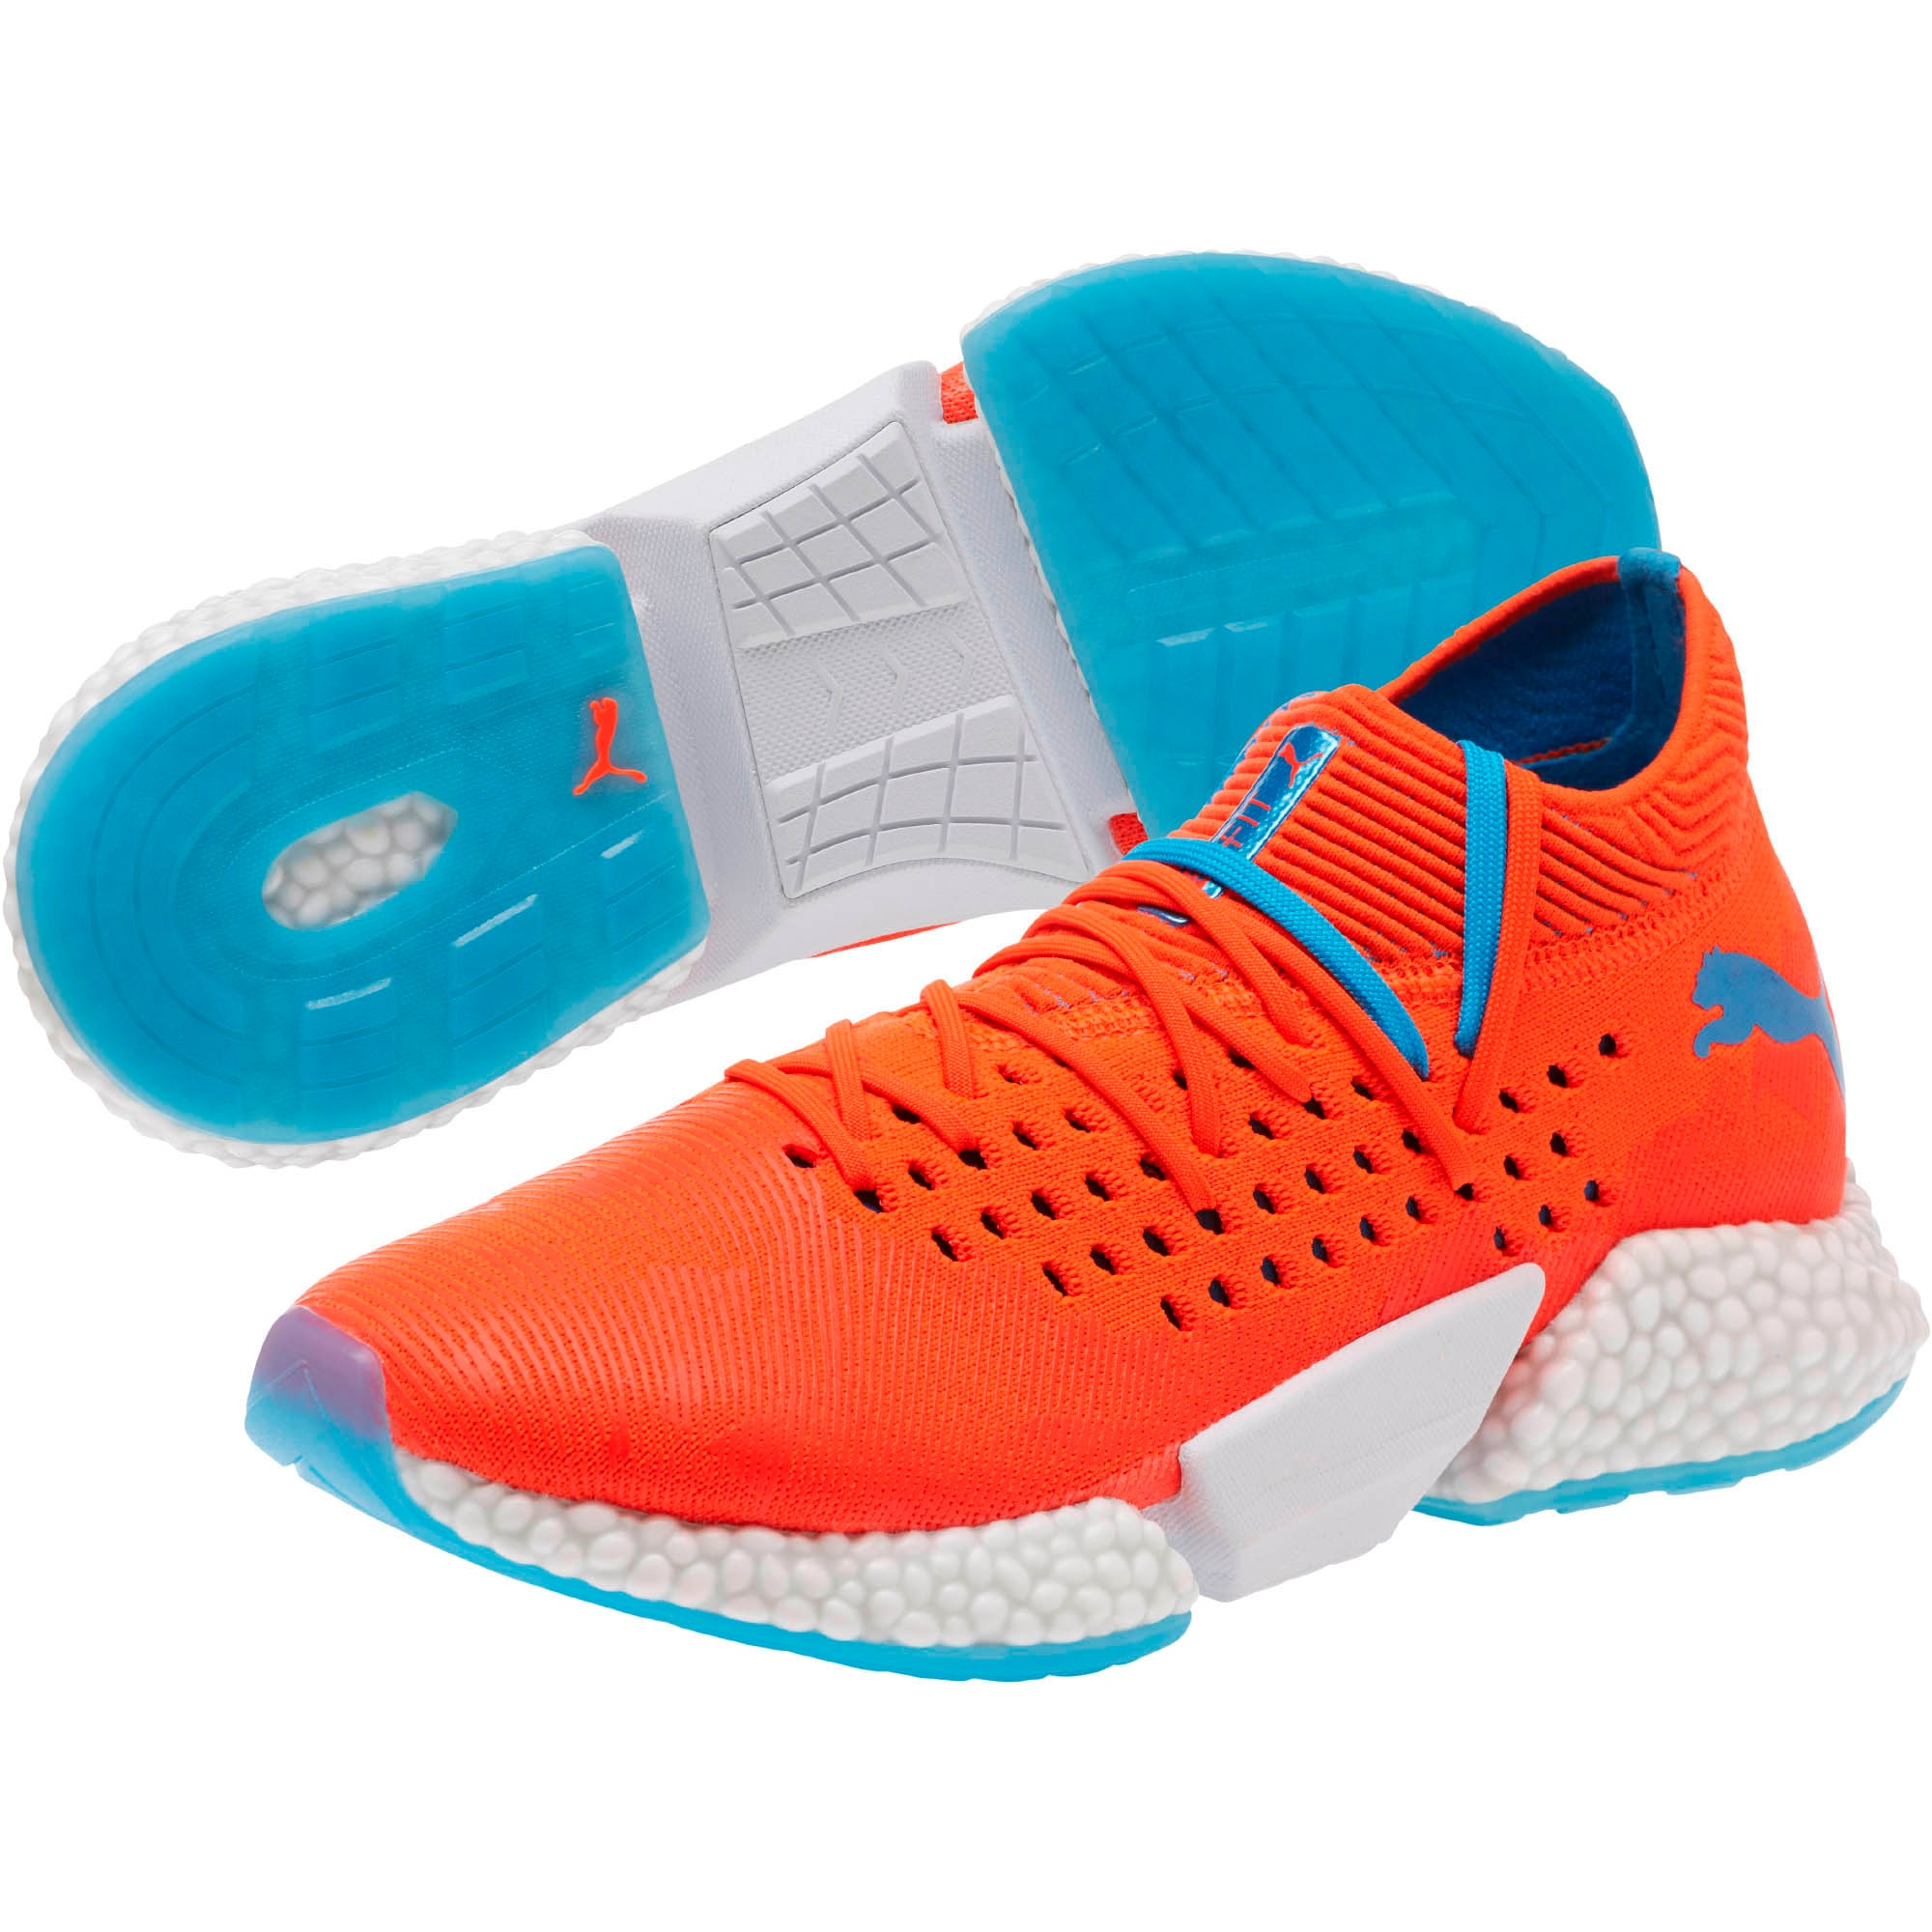 Thumbnail 2 of FUTURE Rocket Men's Running Shoes, Red Blast-Bleu Azur, medium